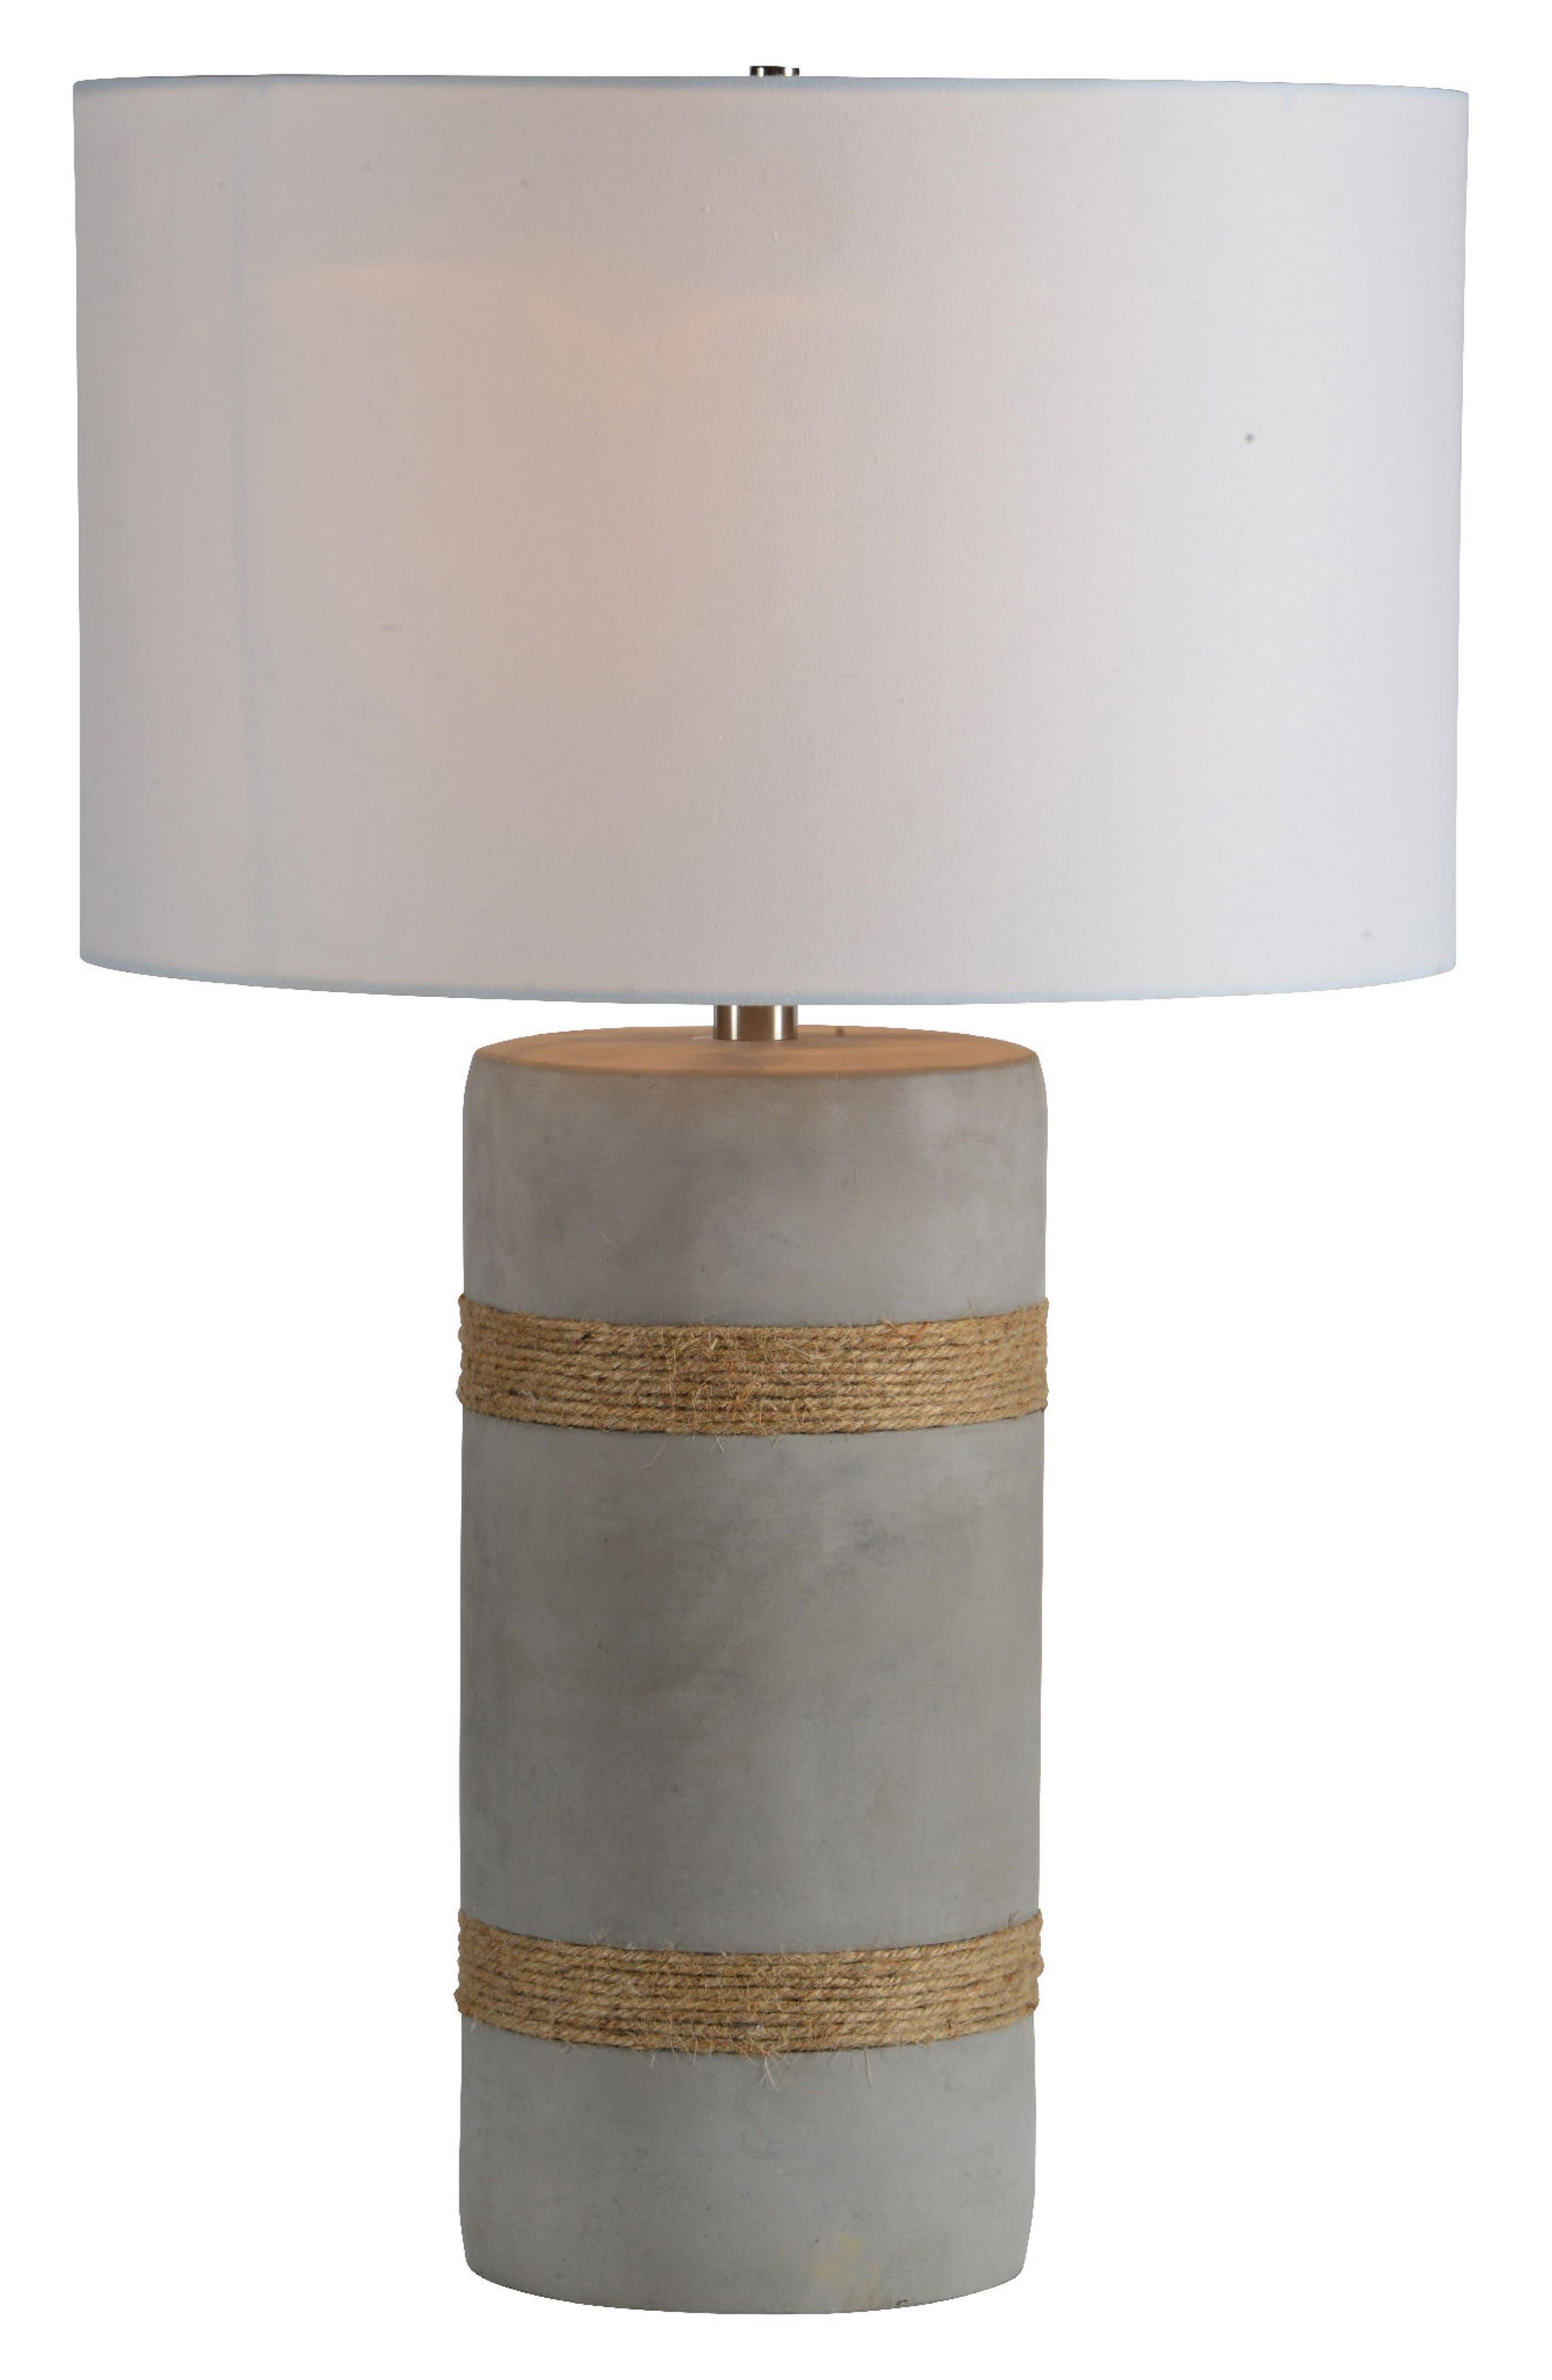 Malden Table Lamp,                             Main thumbnail 1, color,                             ROPE DETAIL